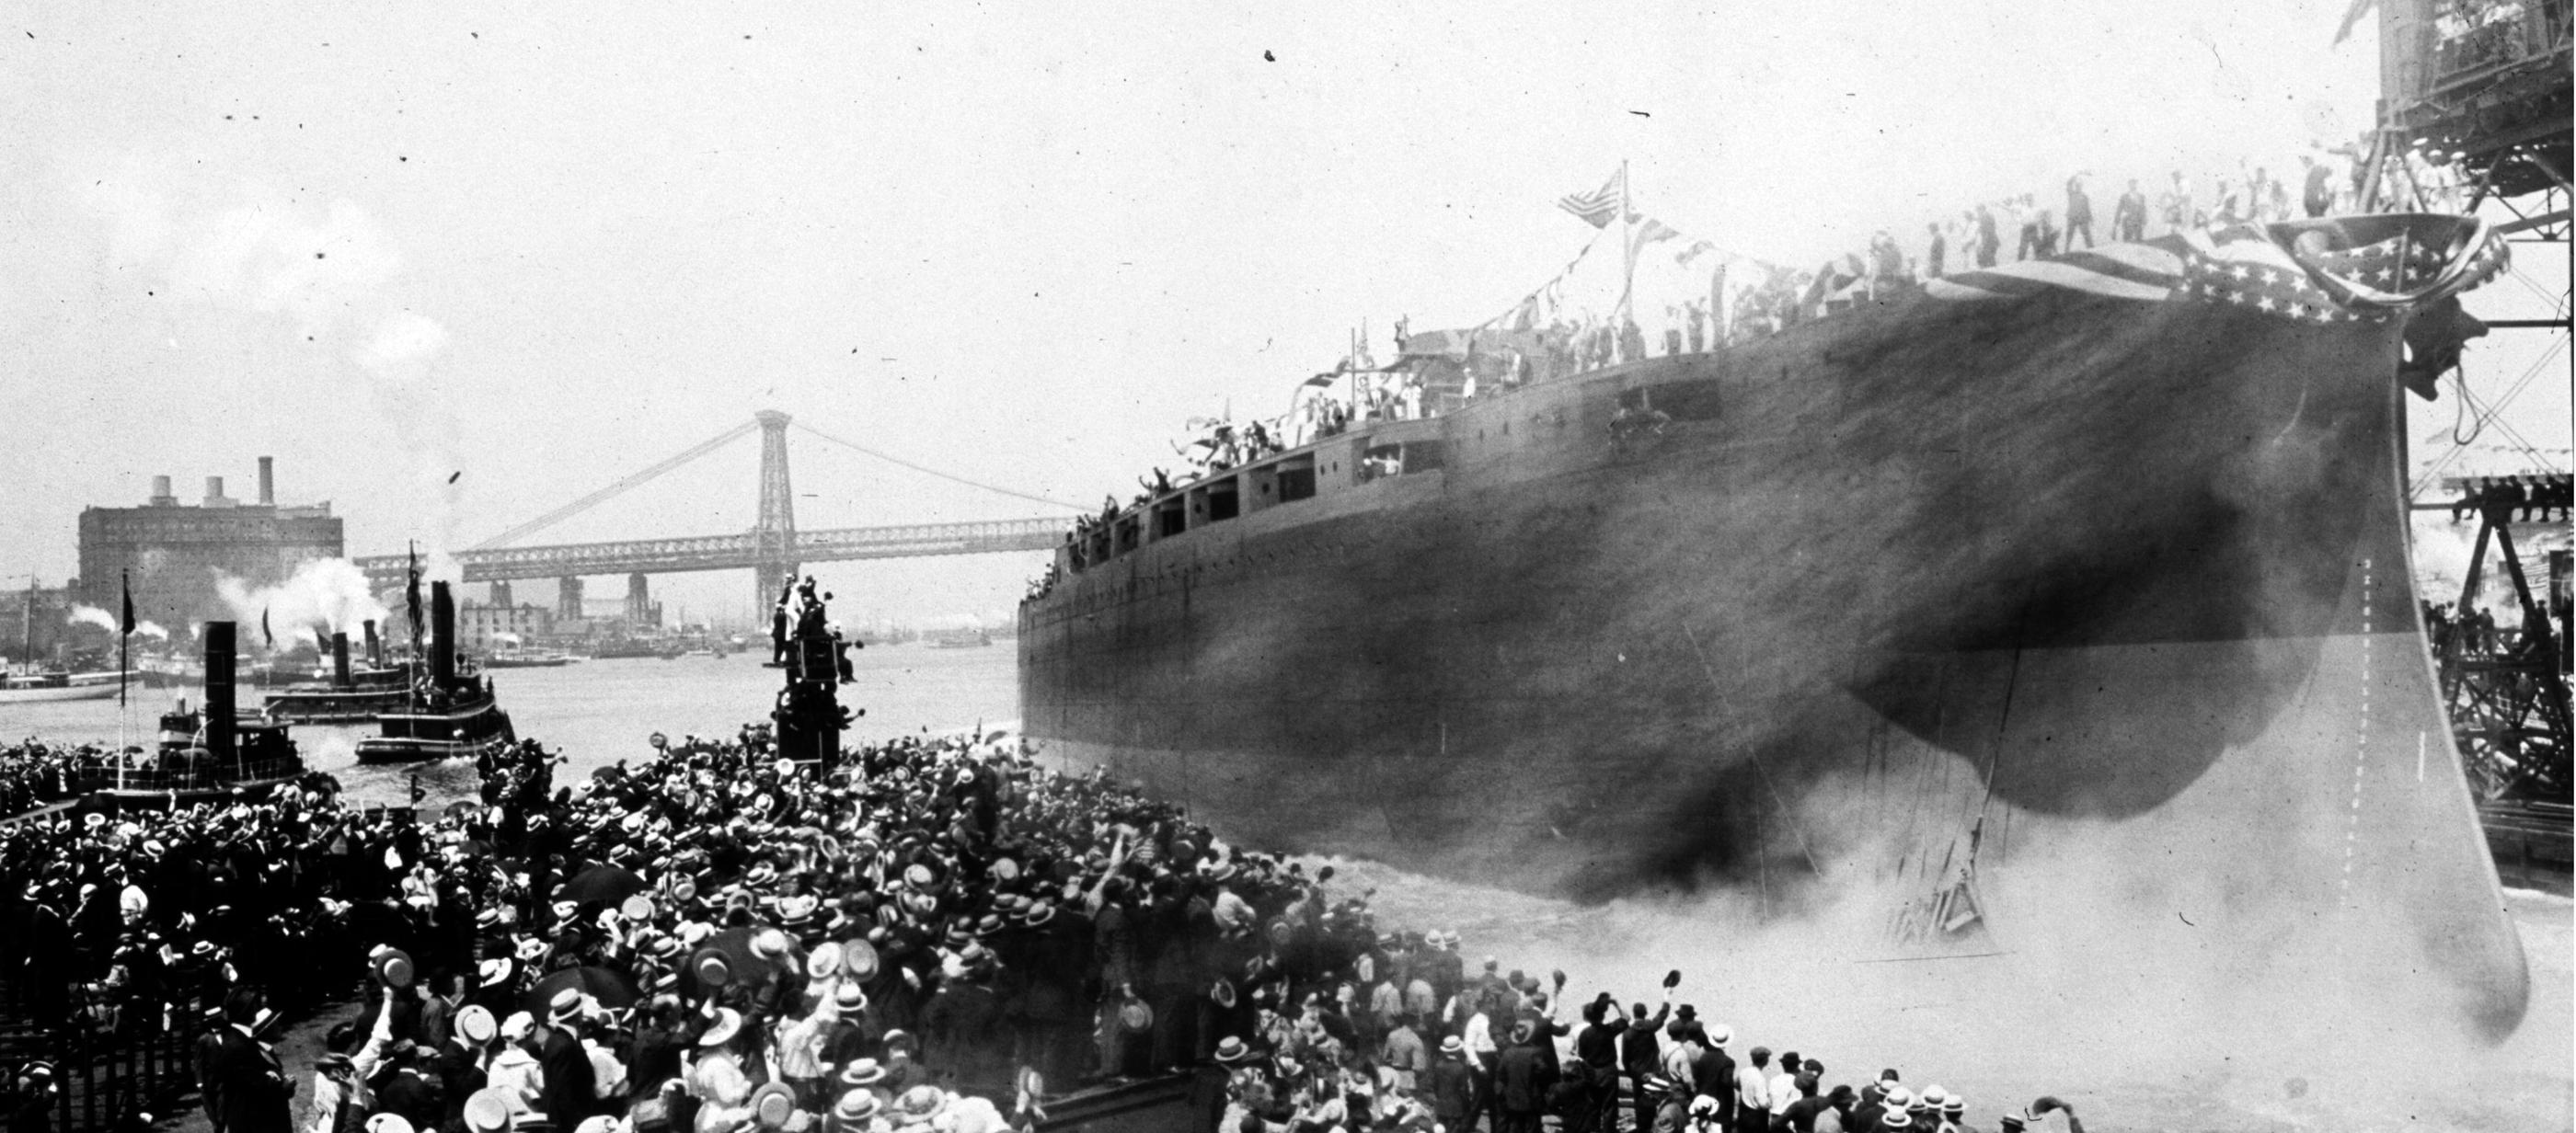 Launching the USS Arizona, Brooklyn Navy Yard, 1915.